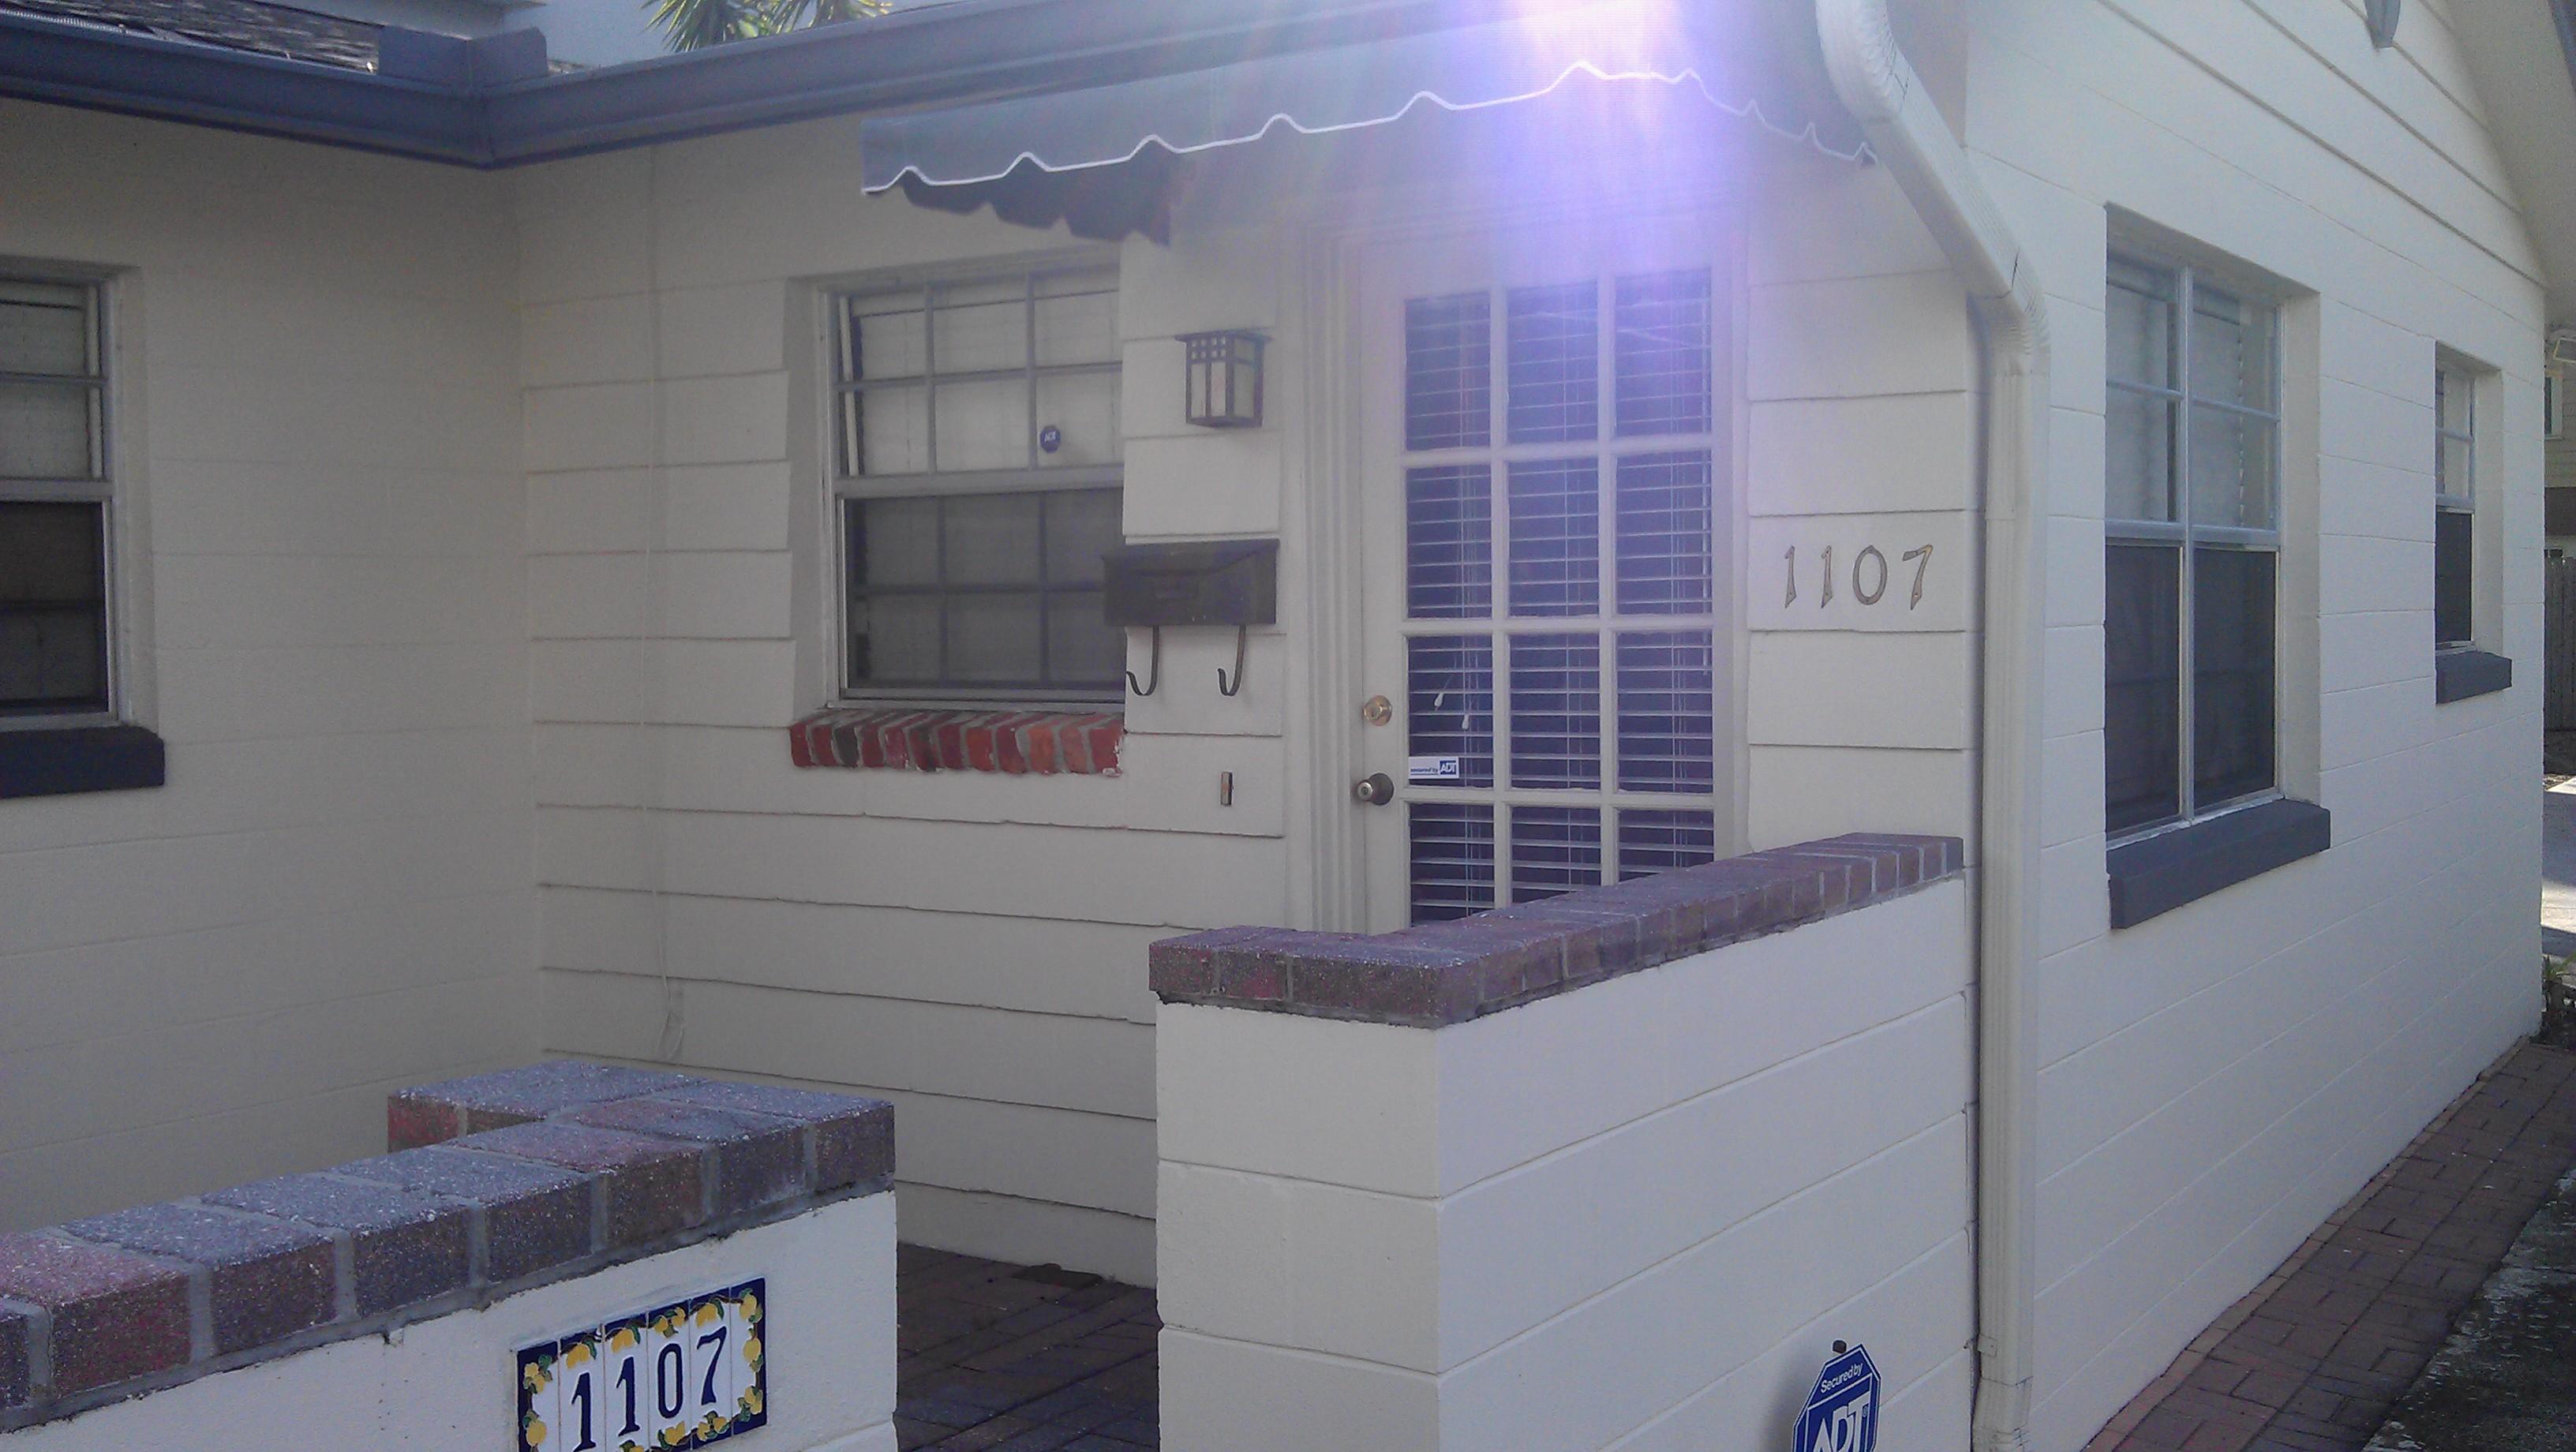 Duplex for Rent in Winter Park